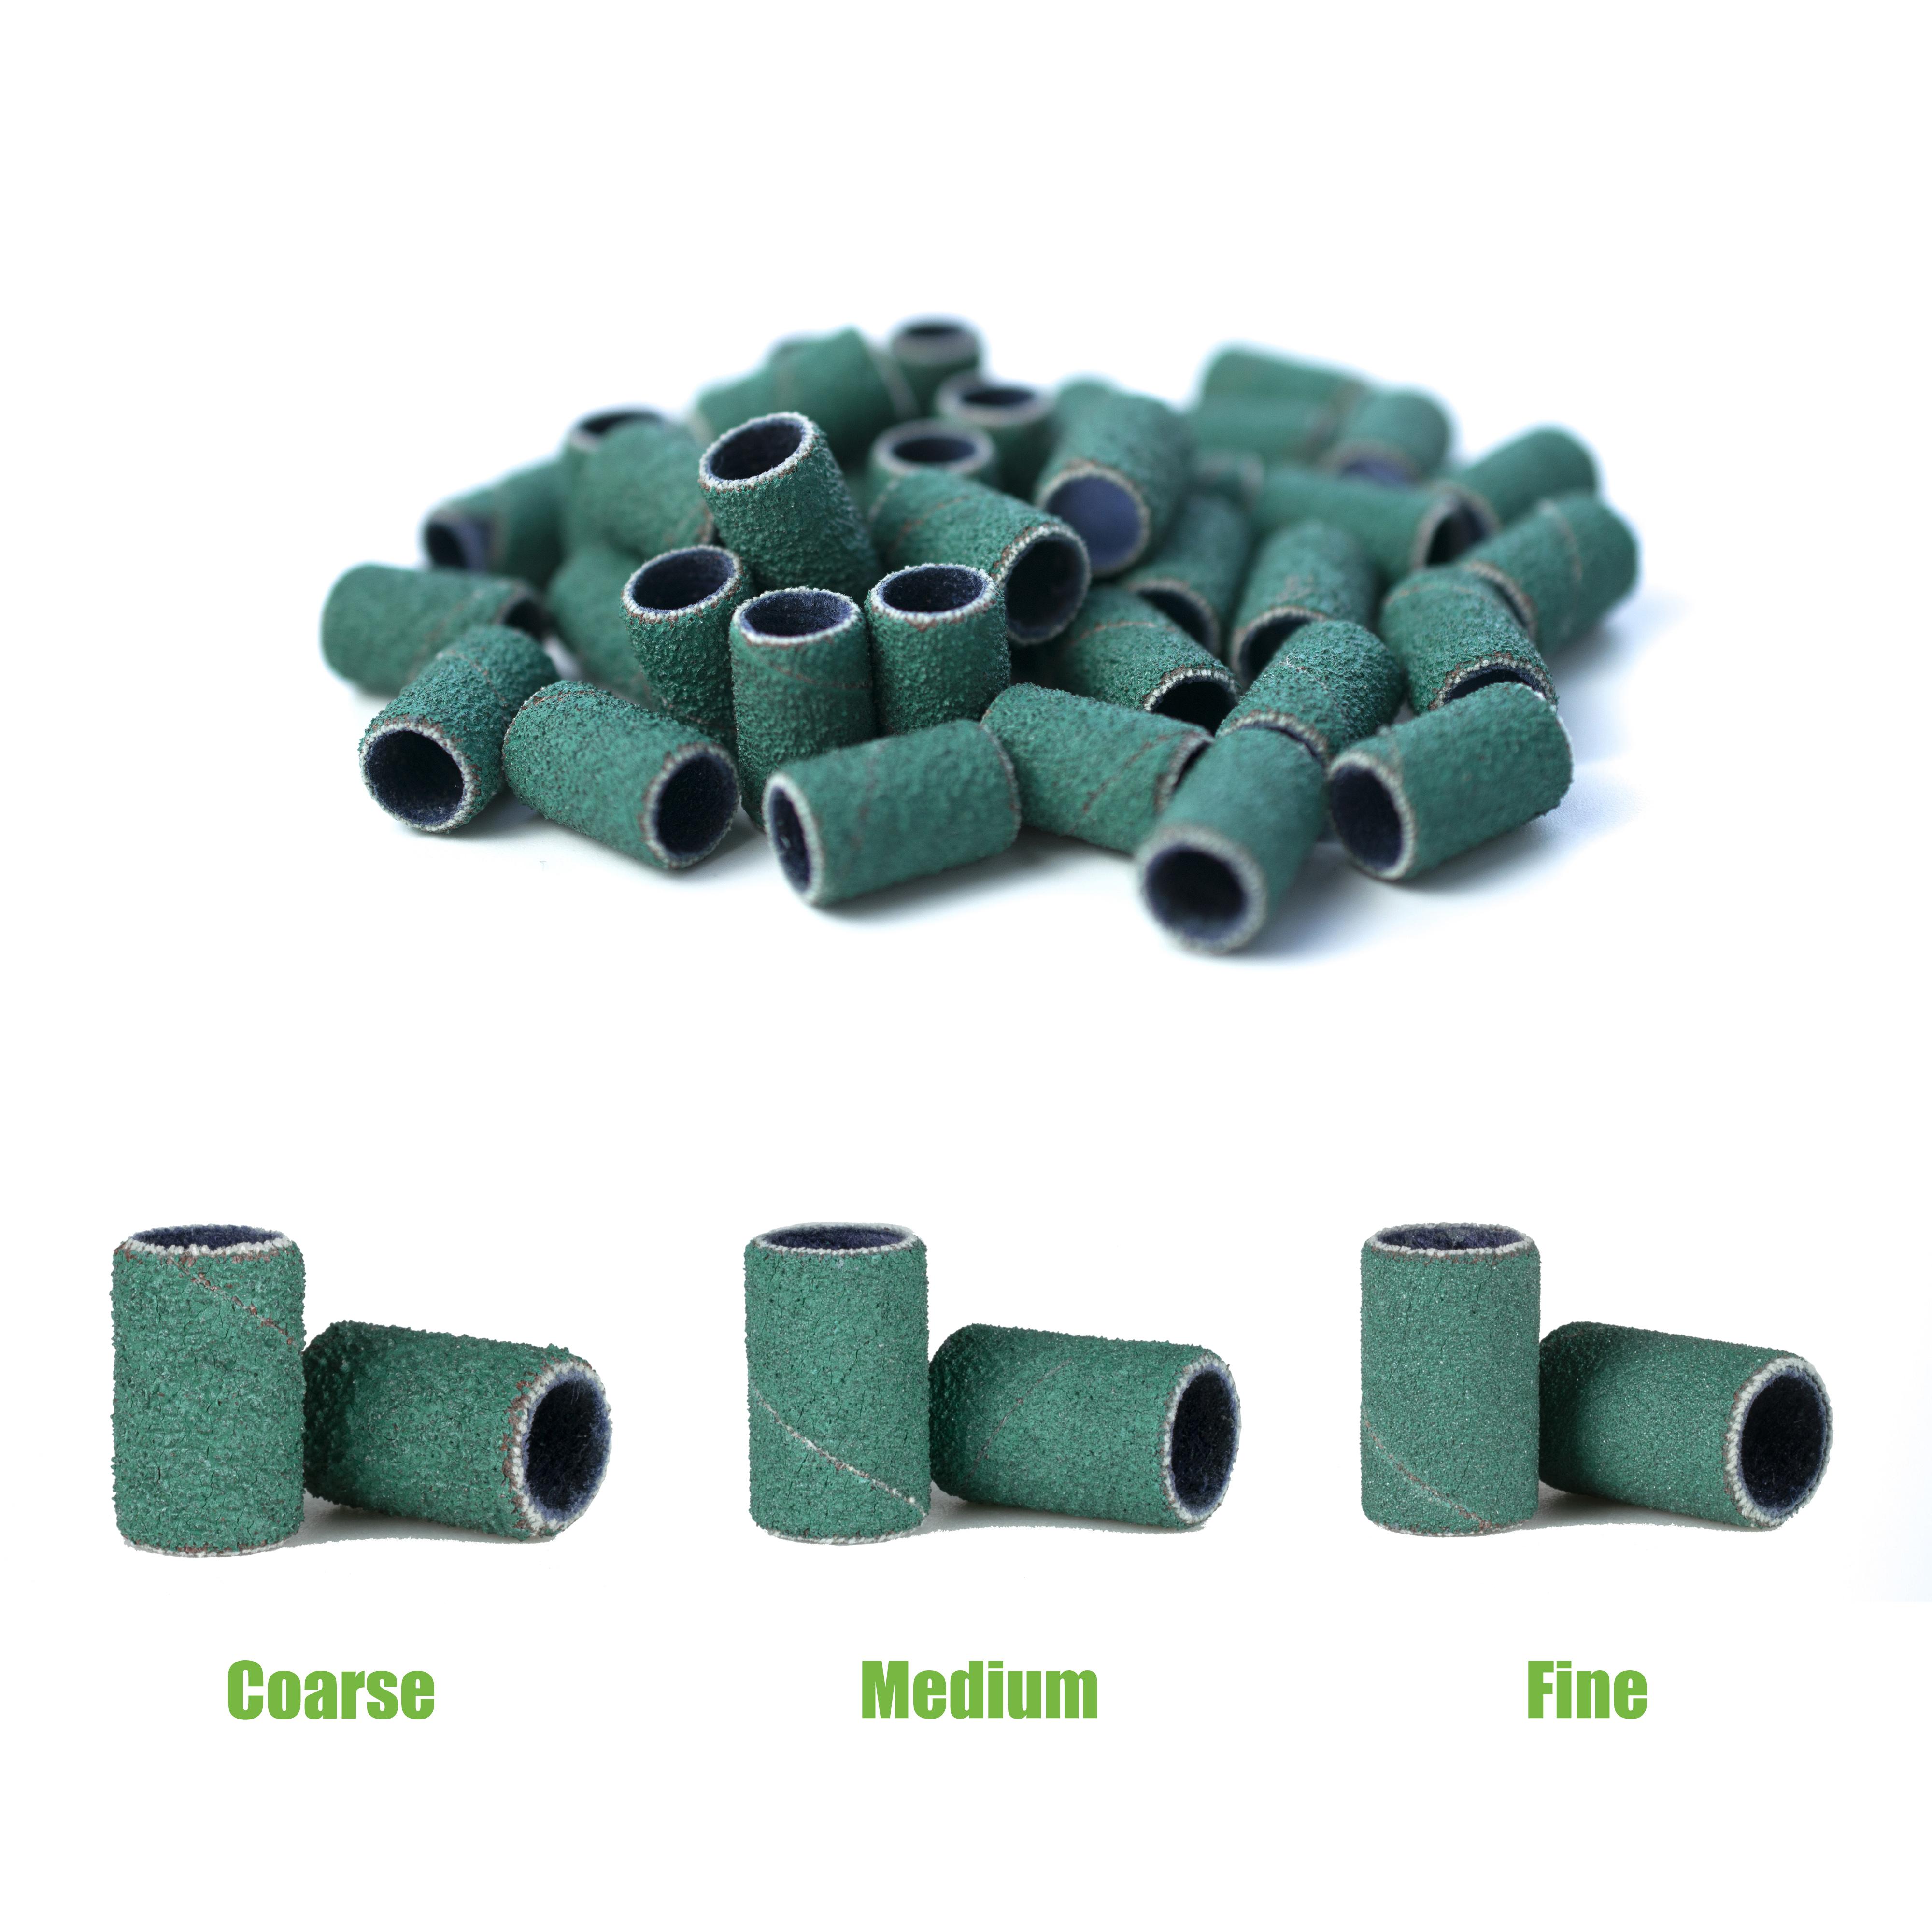 Зеленая абразивная спиральная лента, 1/4*1/2 дюйма, одноразовая шлифовальная лента для ногтей